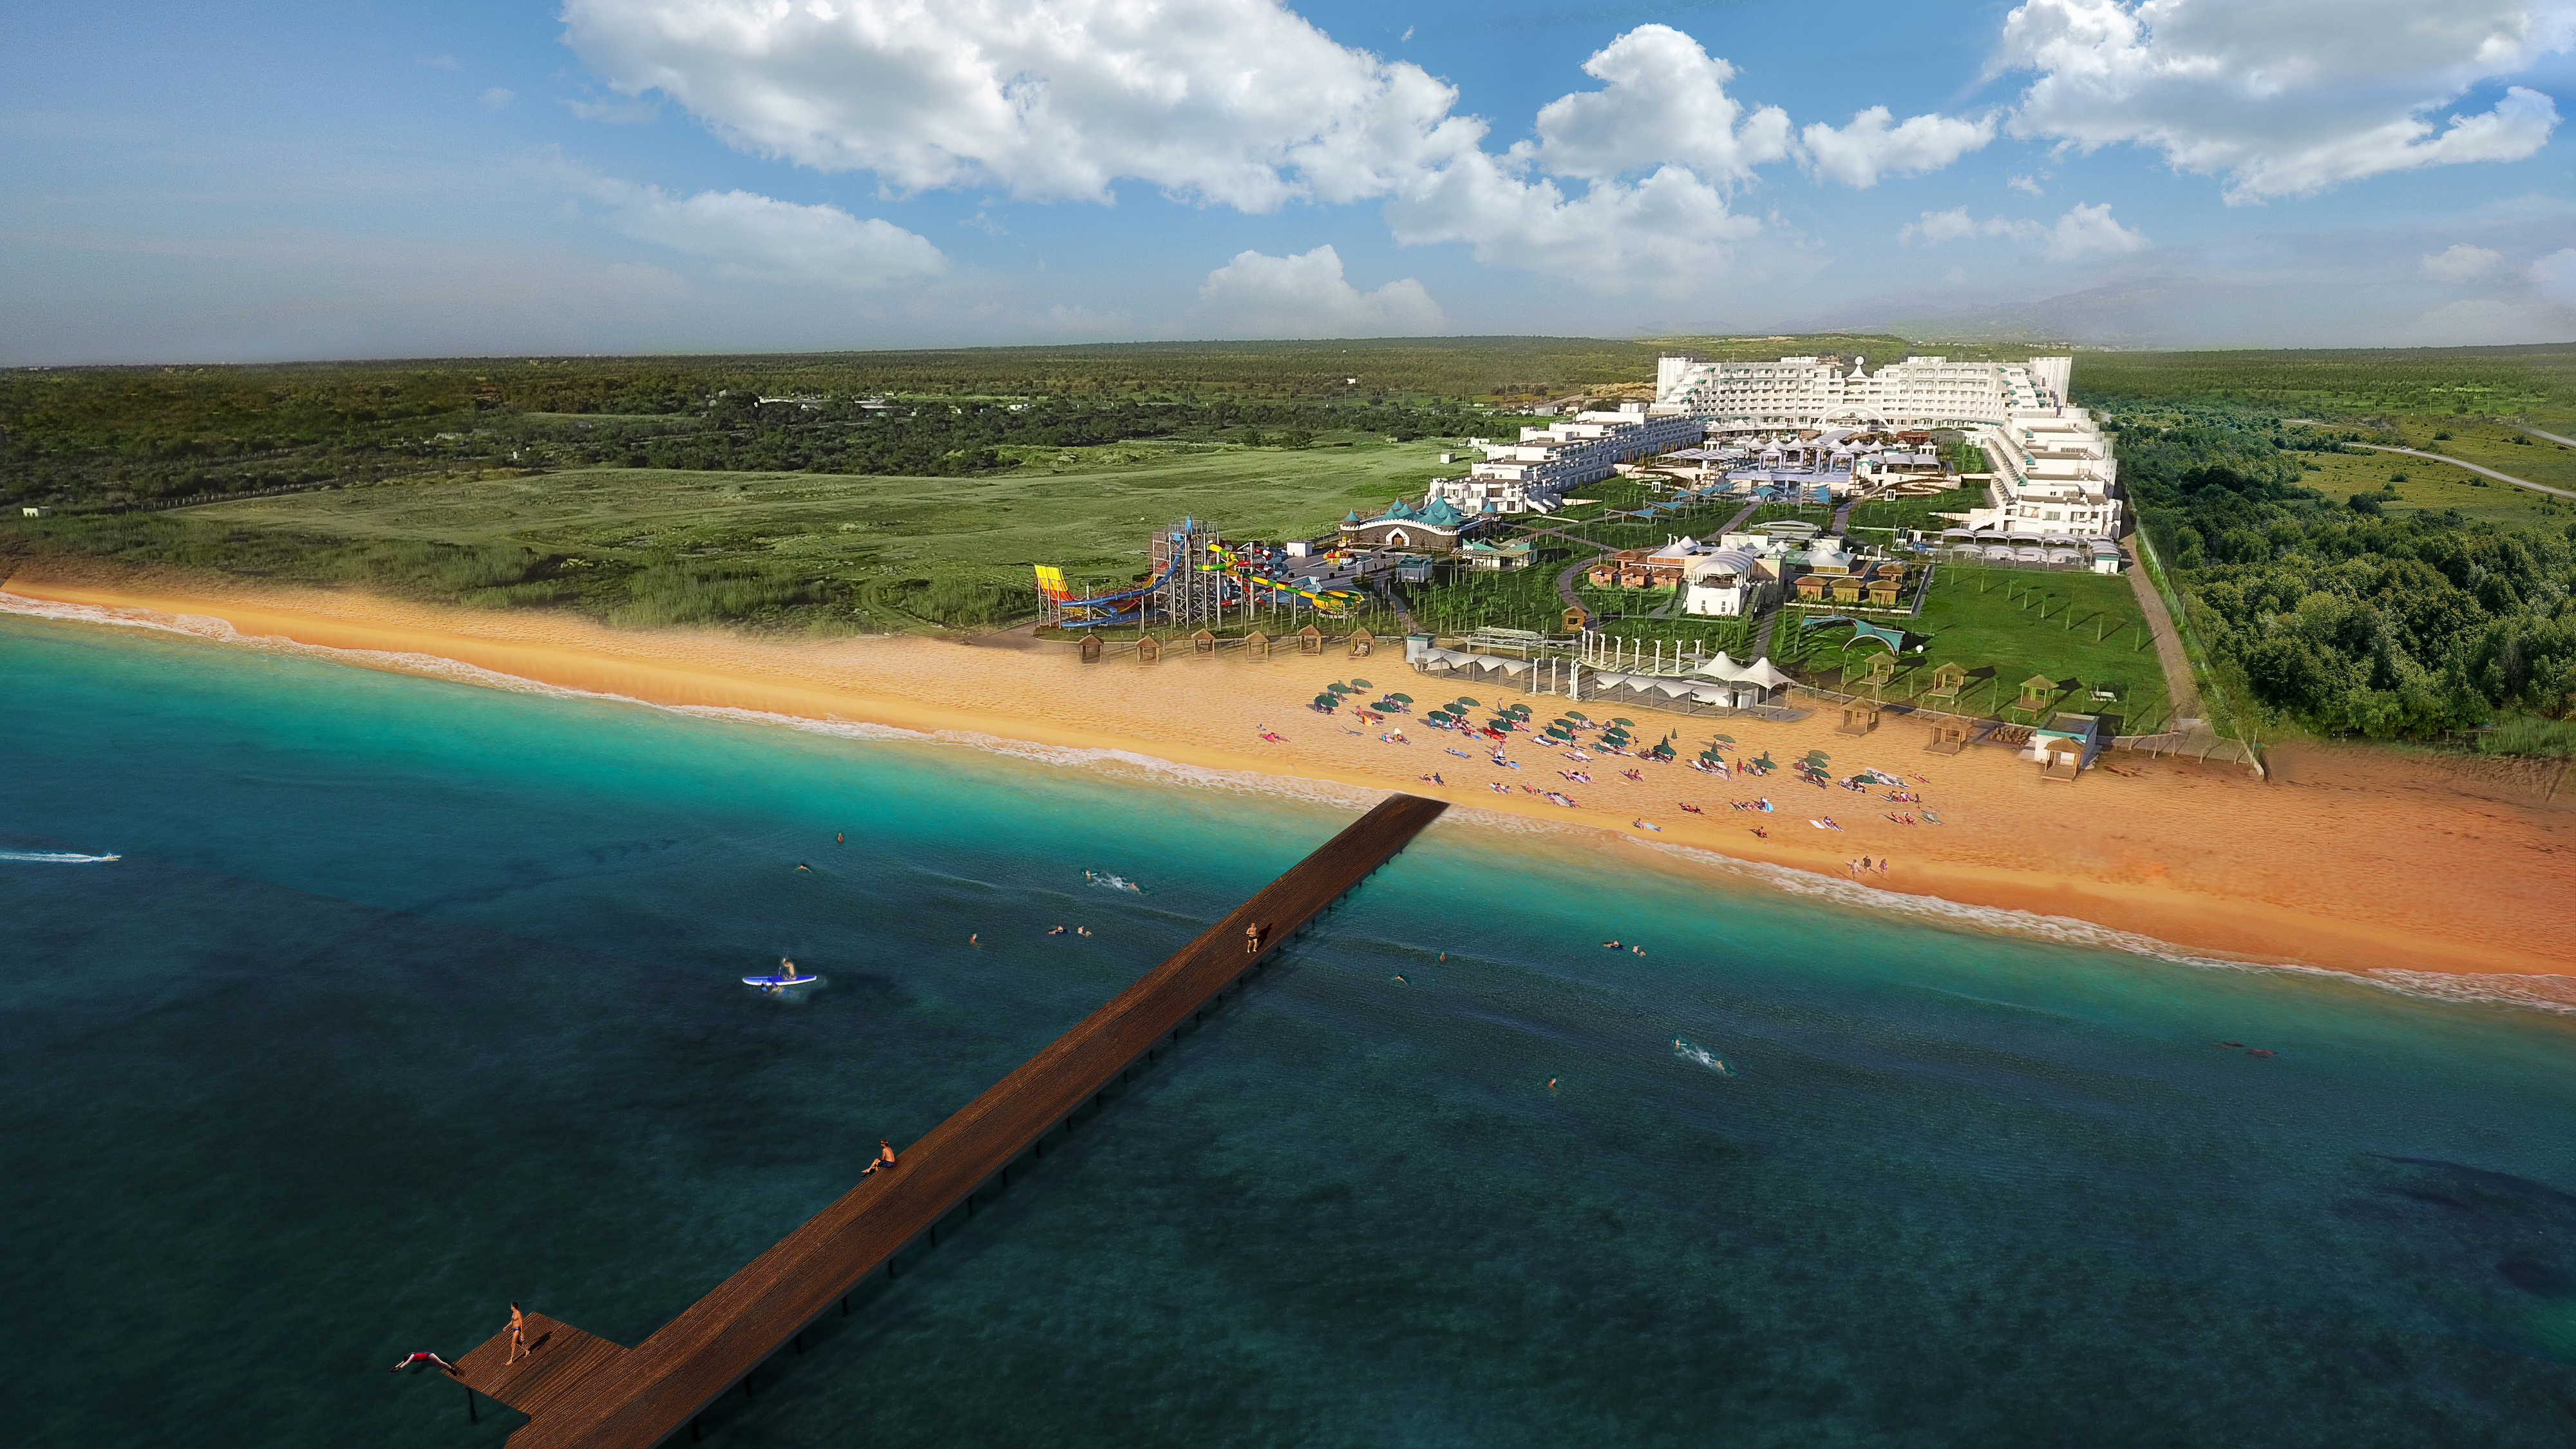 CYPR - ZIMA 2020: Limak Bafra Deluxe Hotel & Resort*****, 8 dni (13-20.01.2020 r.), ultra all inclusive: 1698,00 PLN/os. dorosła